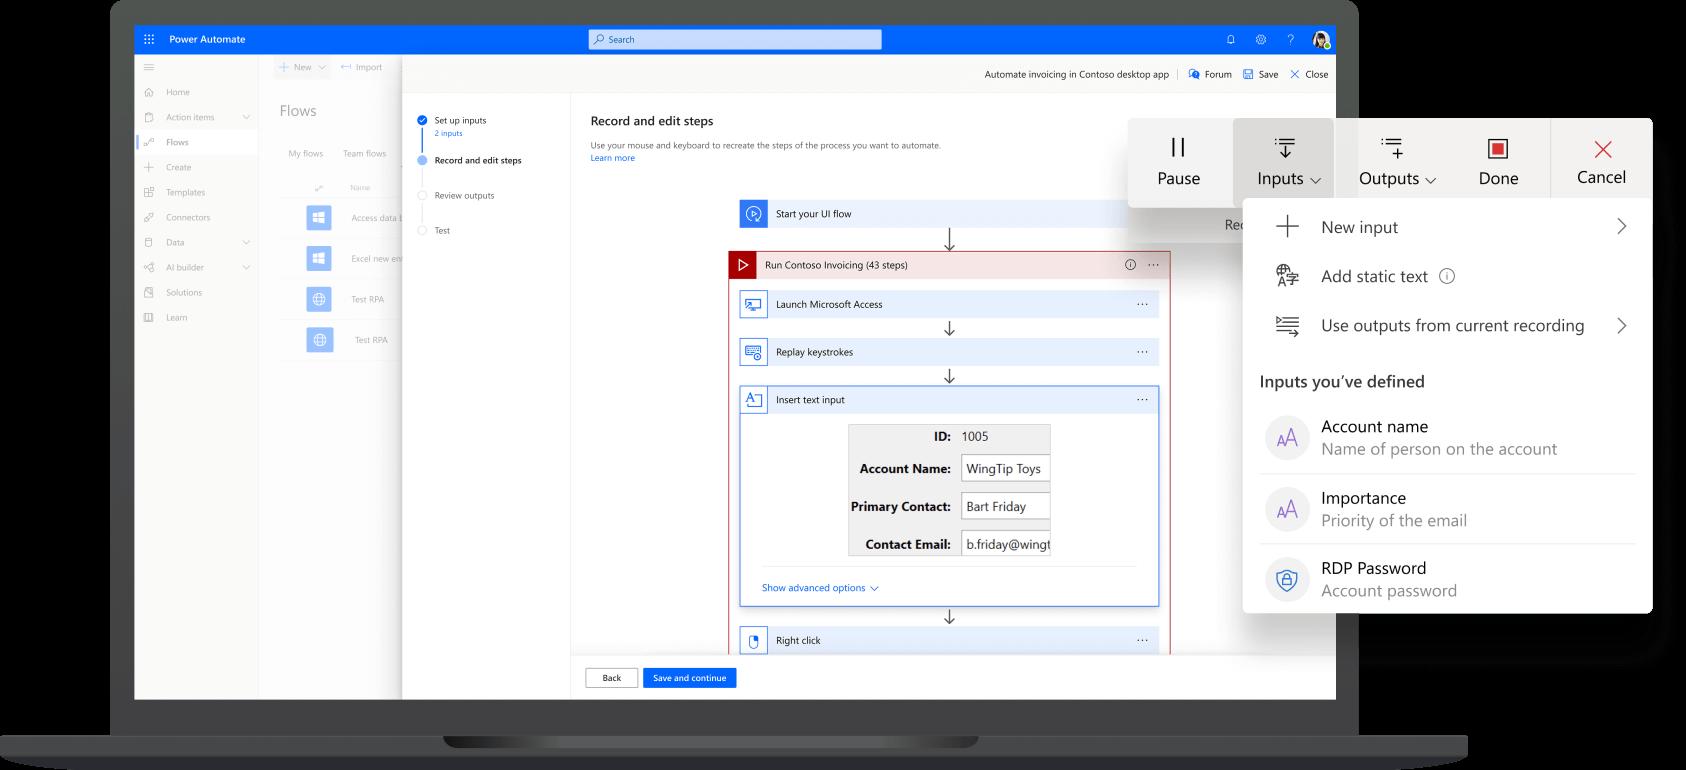 Plataforma de energia da Microsoft - Power Automate